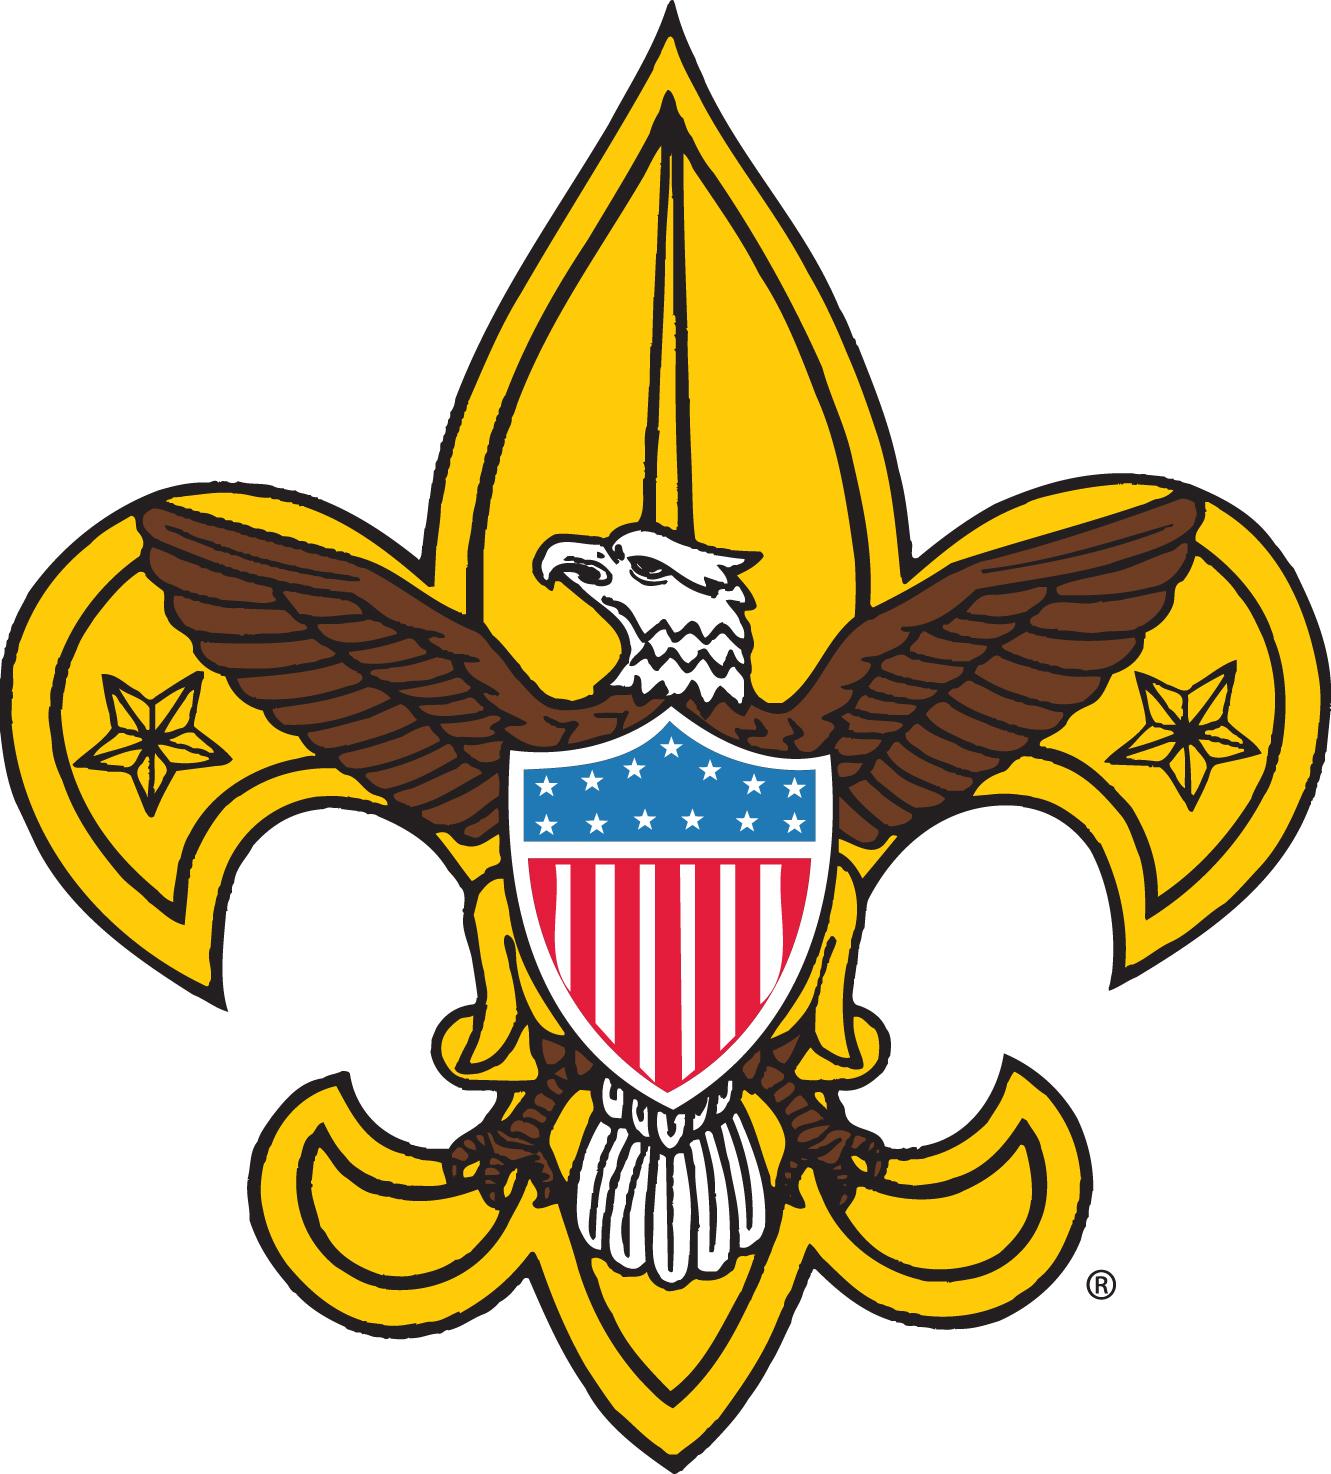 Boy Scout Boys Scout Clip Art Clipartall-Boy scout boys scout clip art clipartall-3